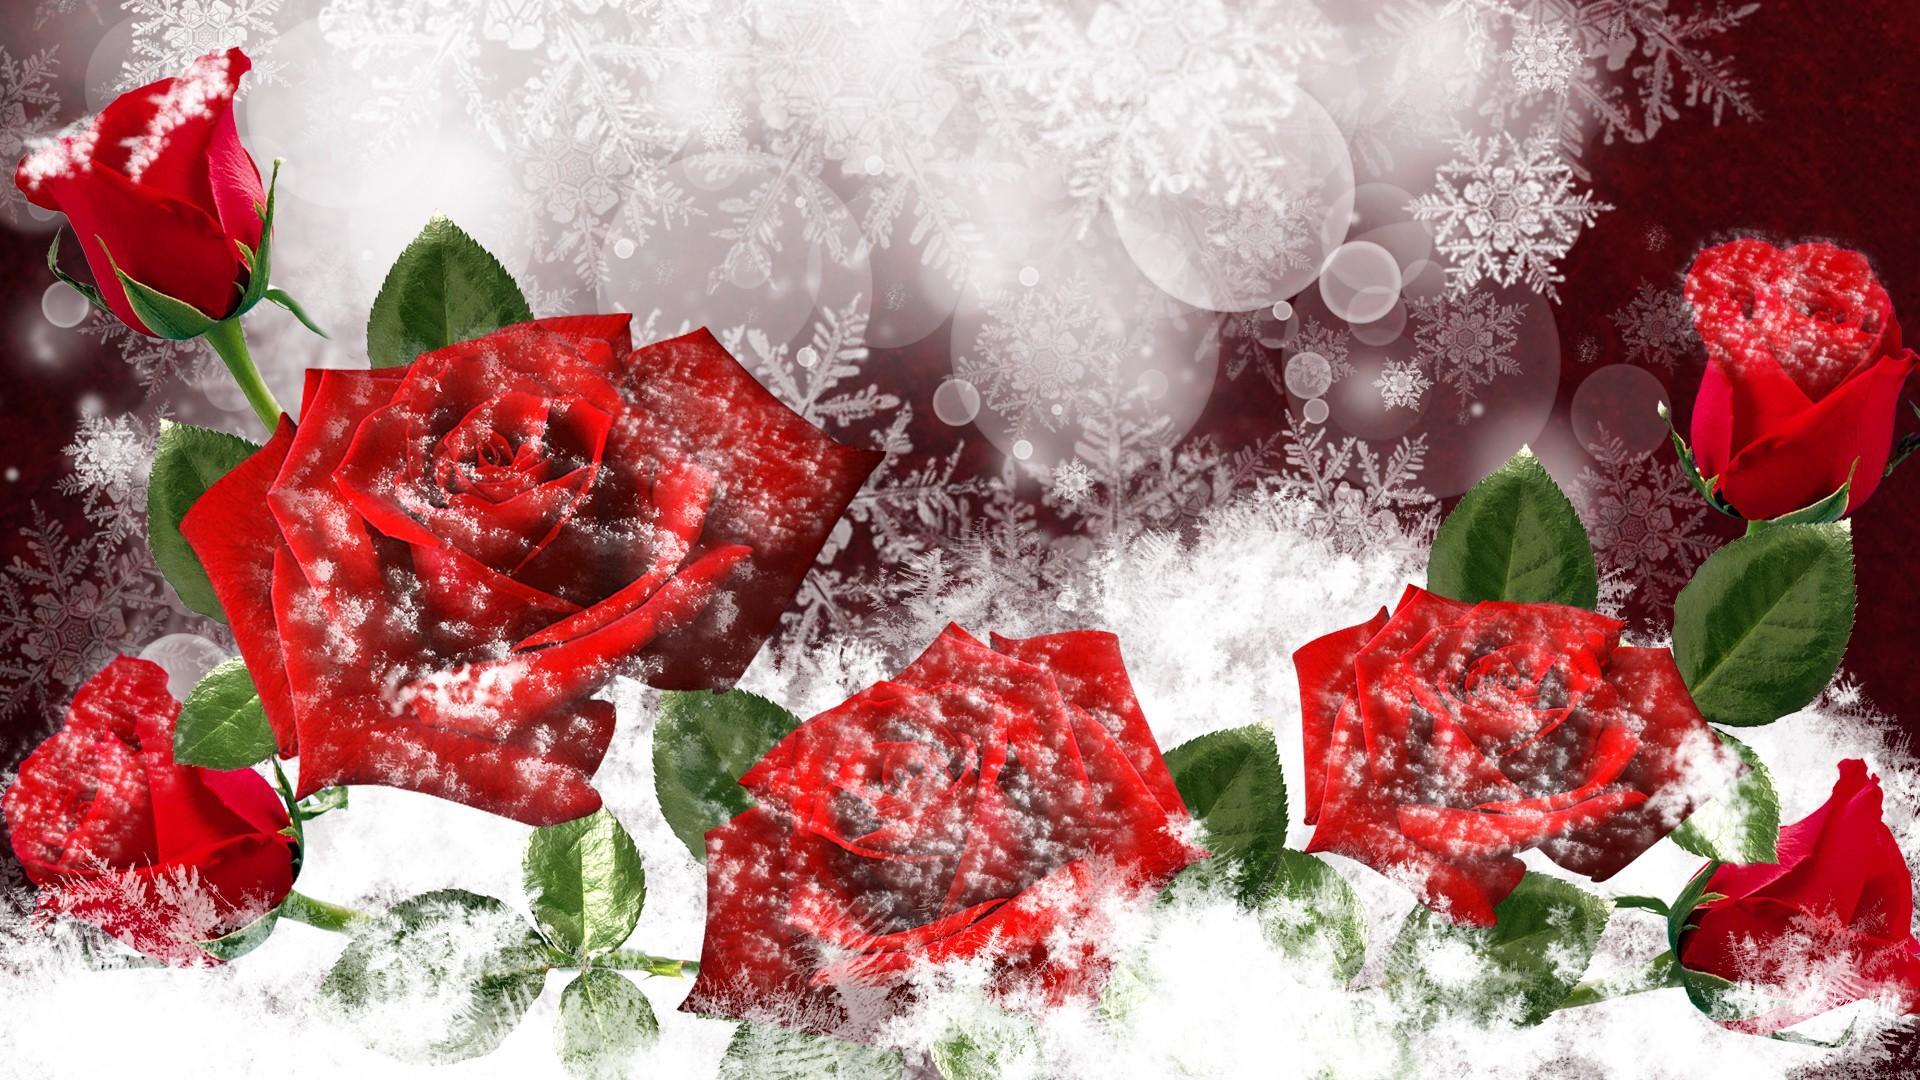 Cute Anime Vector Wallpaper Wonderful Red Frozen Roses Hd Winter Wallpaper